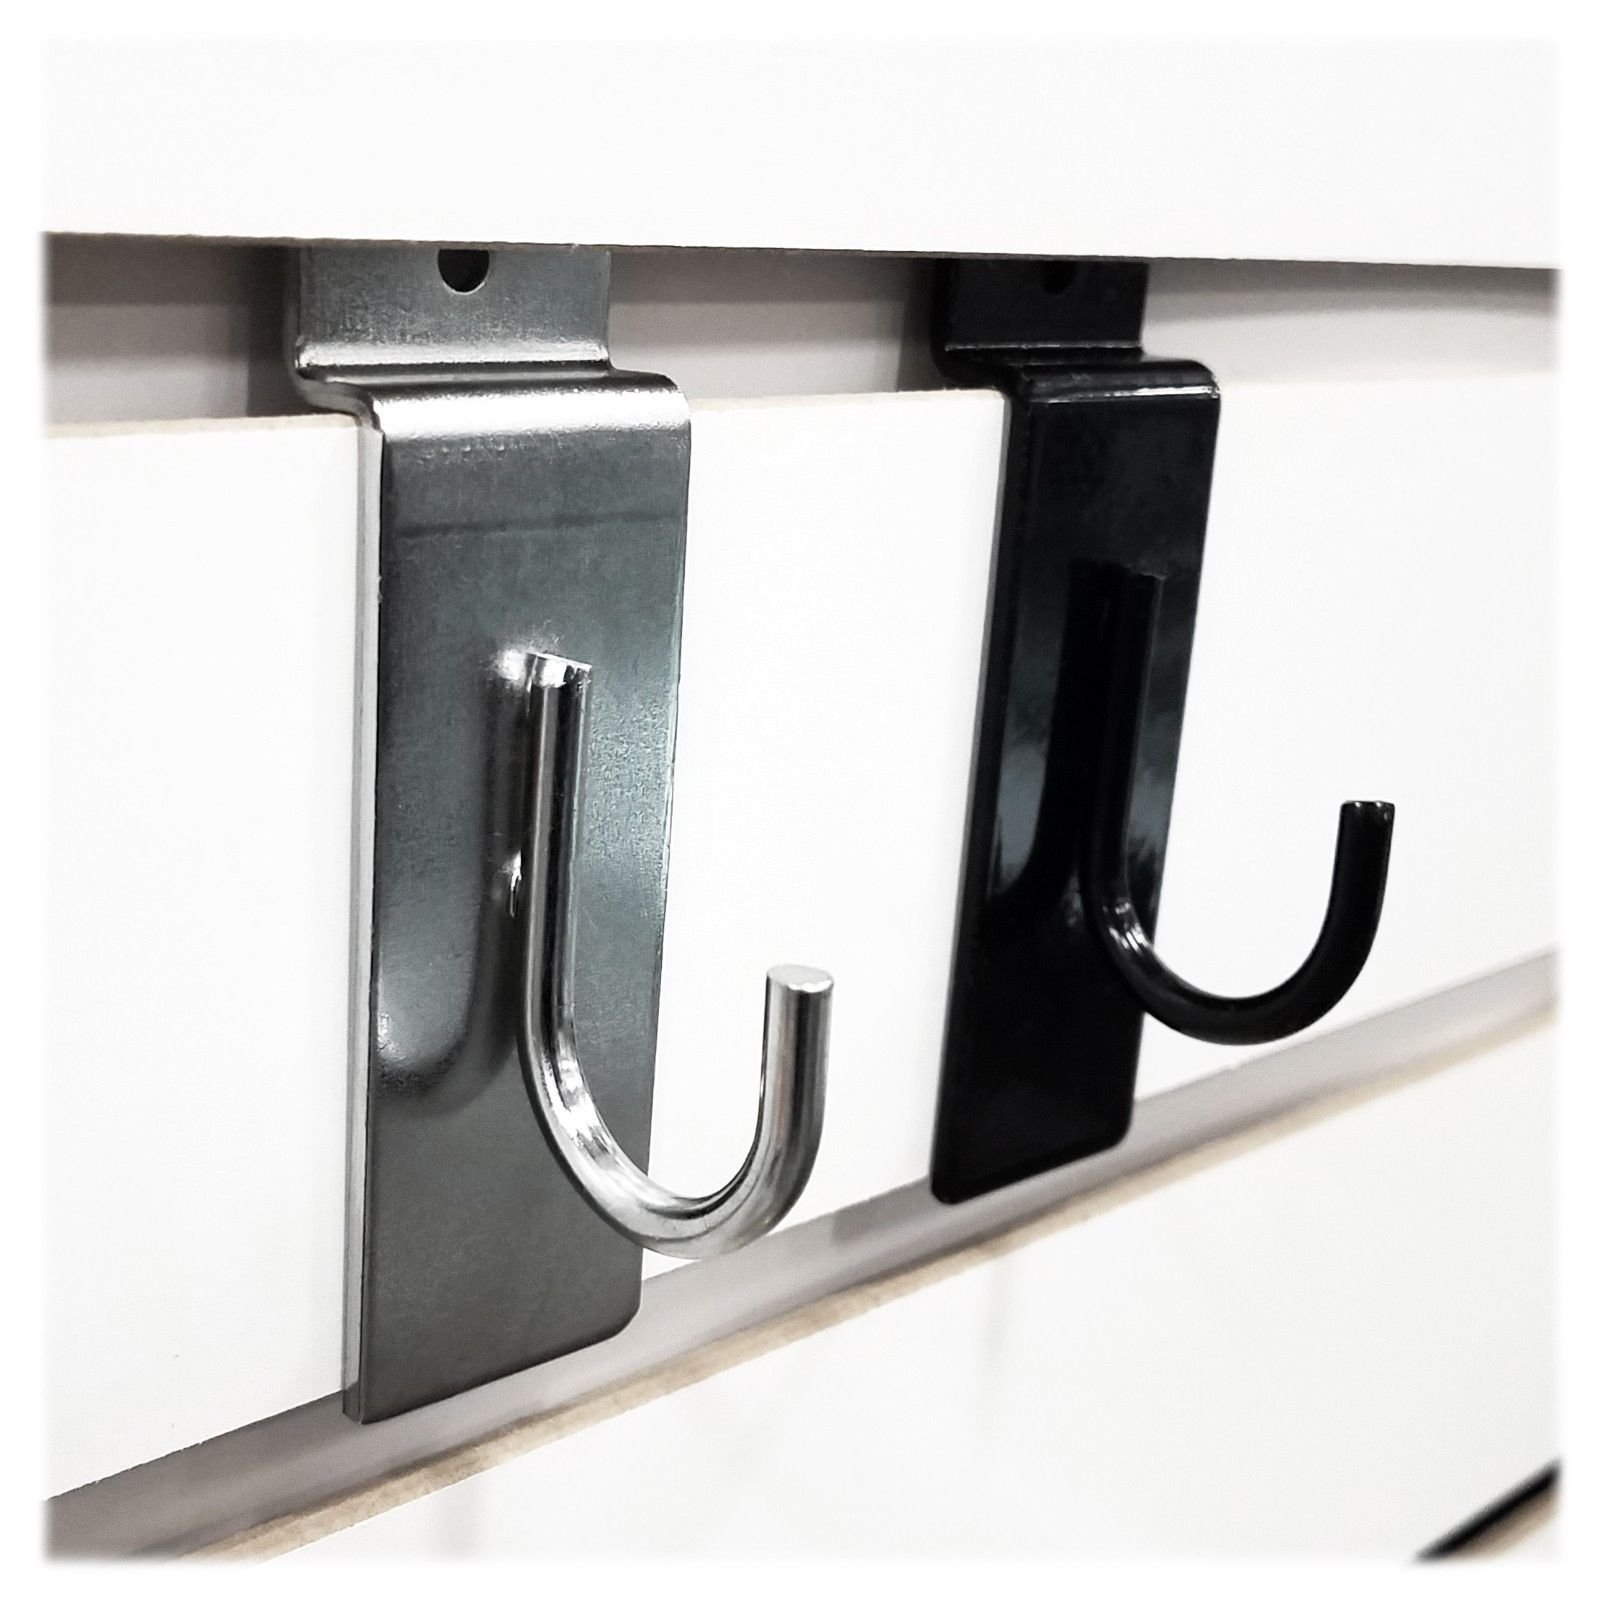 Chrome J-Hook, J Shaped Utility Hanger for Slatwall Displays & Slatgrid Panels - 25 Pack